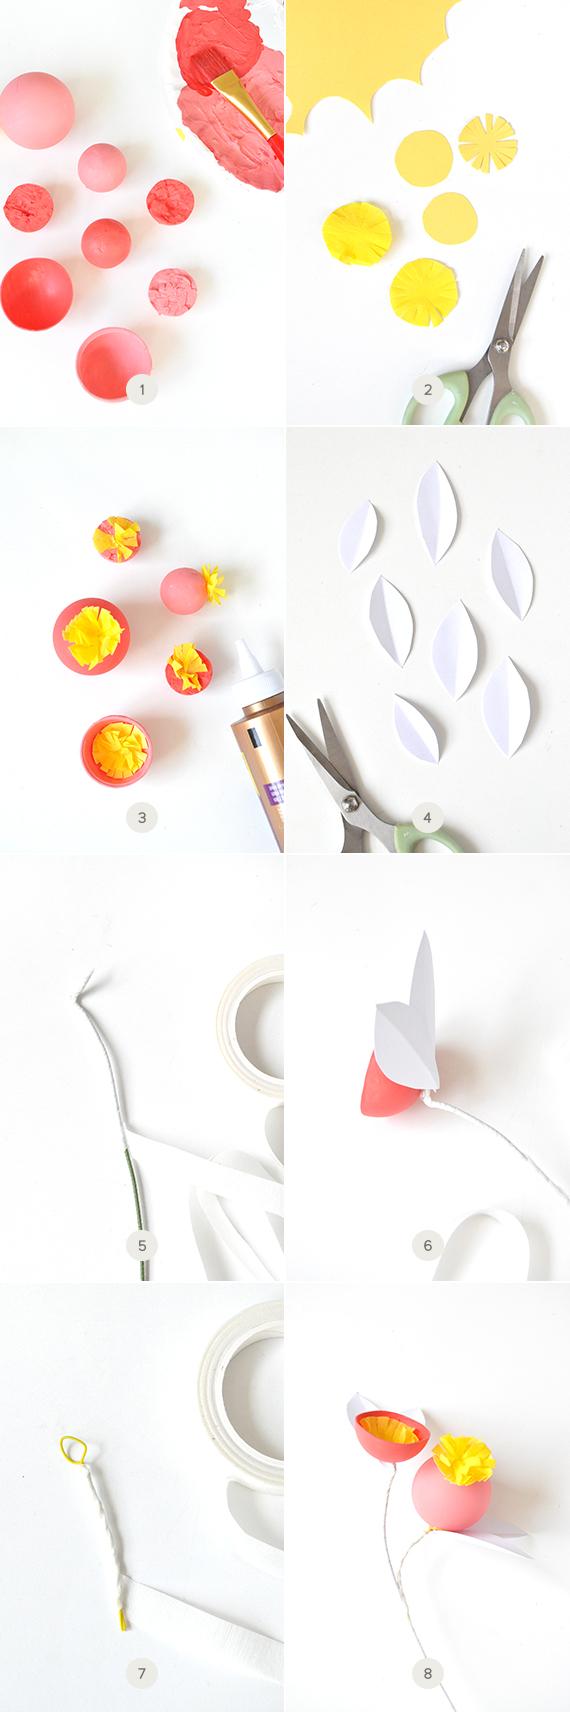 DIY Whimsical Valentine's Flowers   Julep